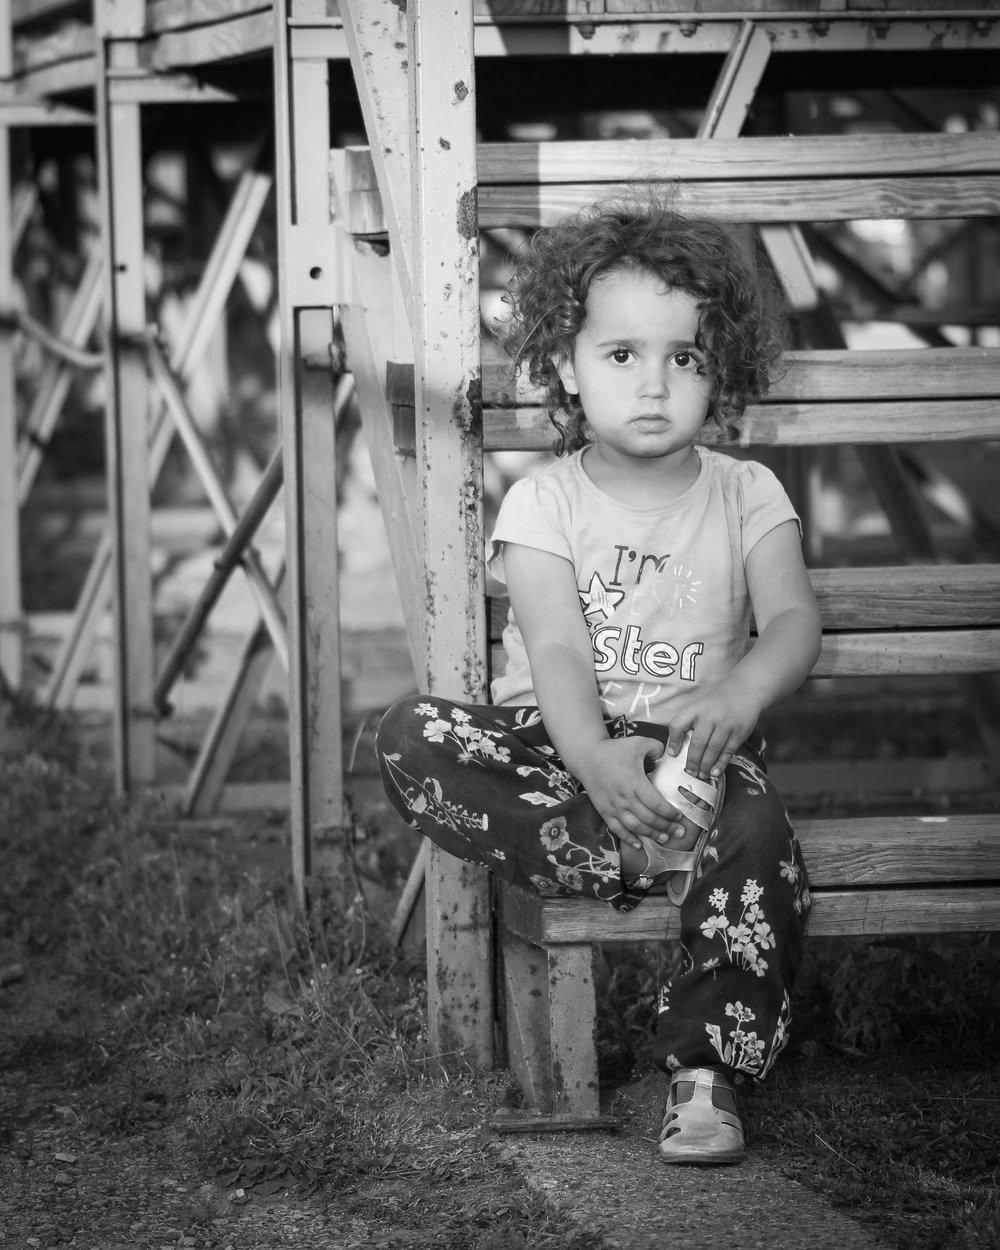 portraits-5.jpg